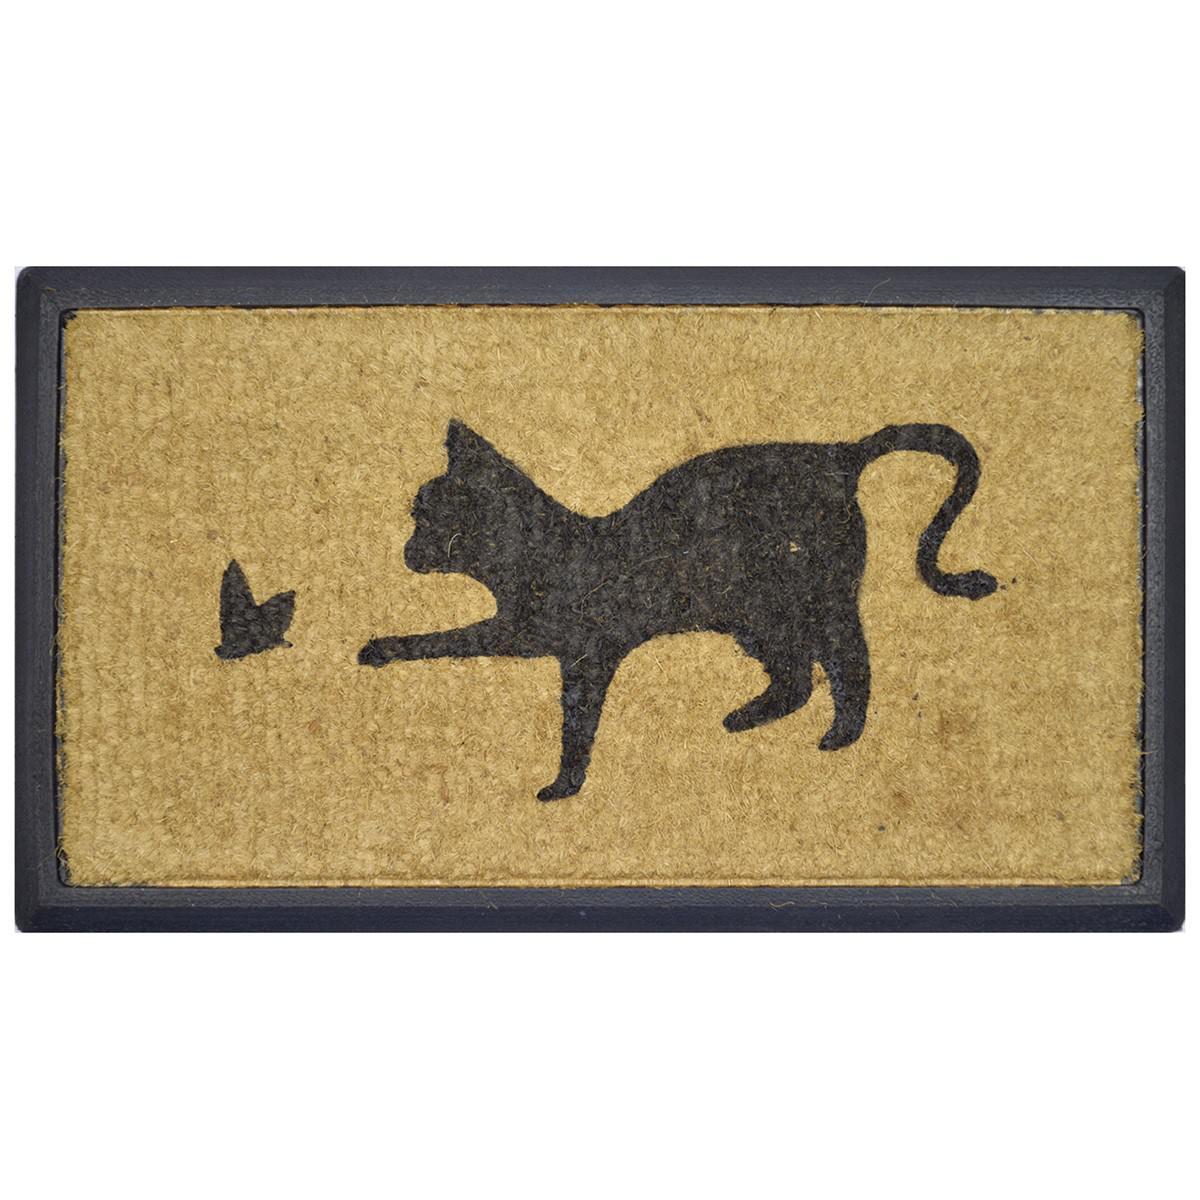 Playing Cat Rubber Edged Coir Doormat, 70x40cm